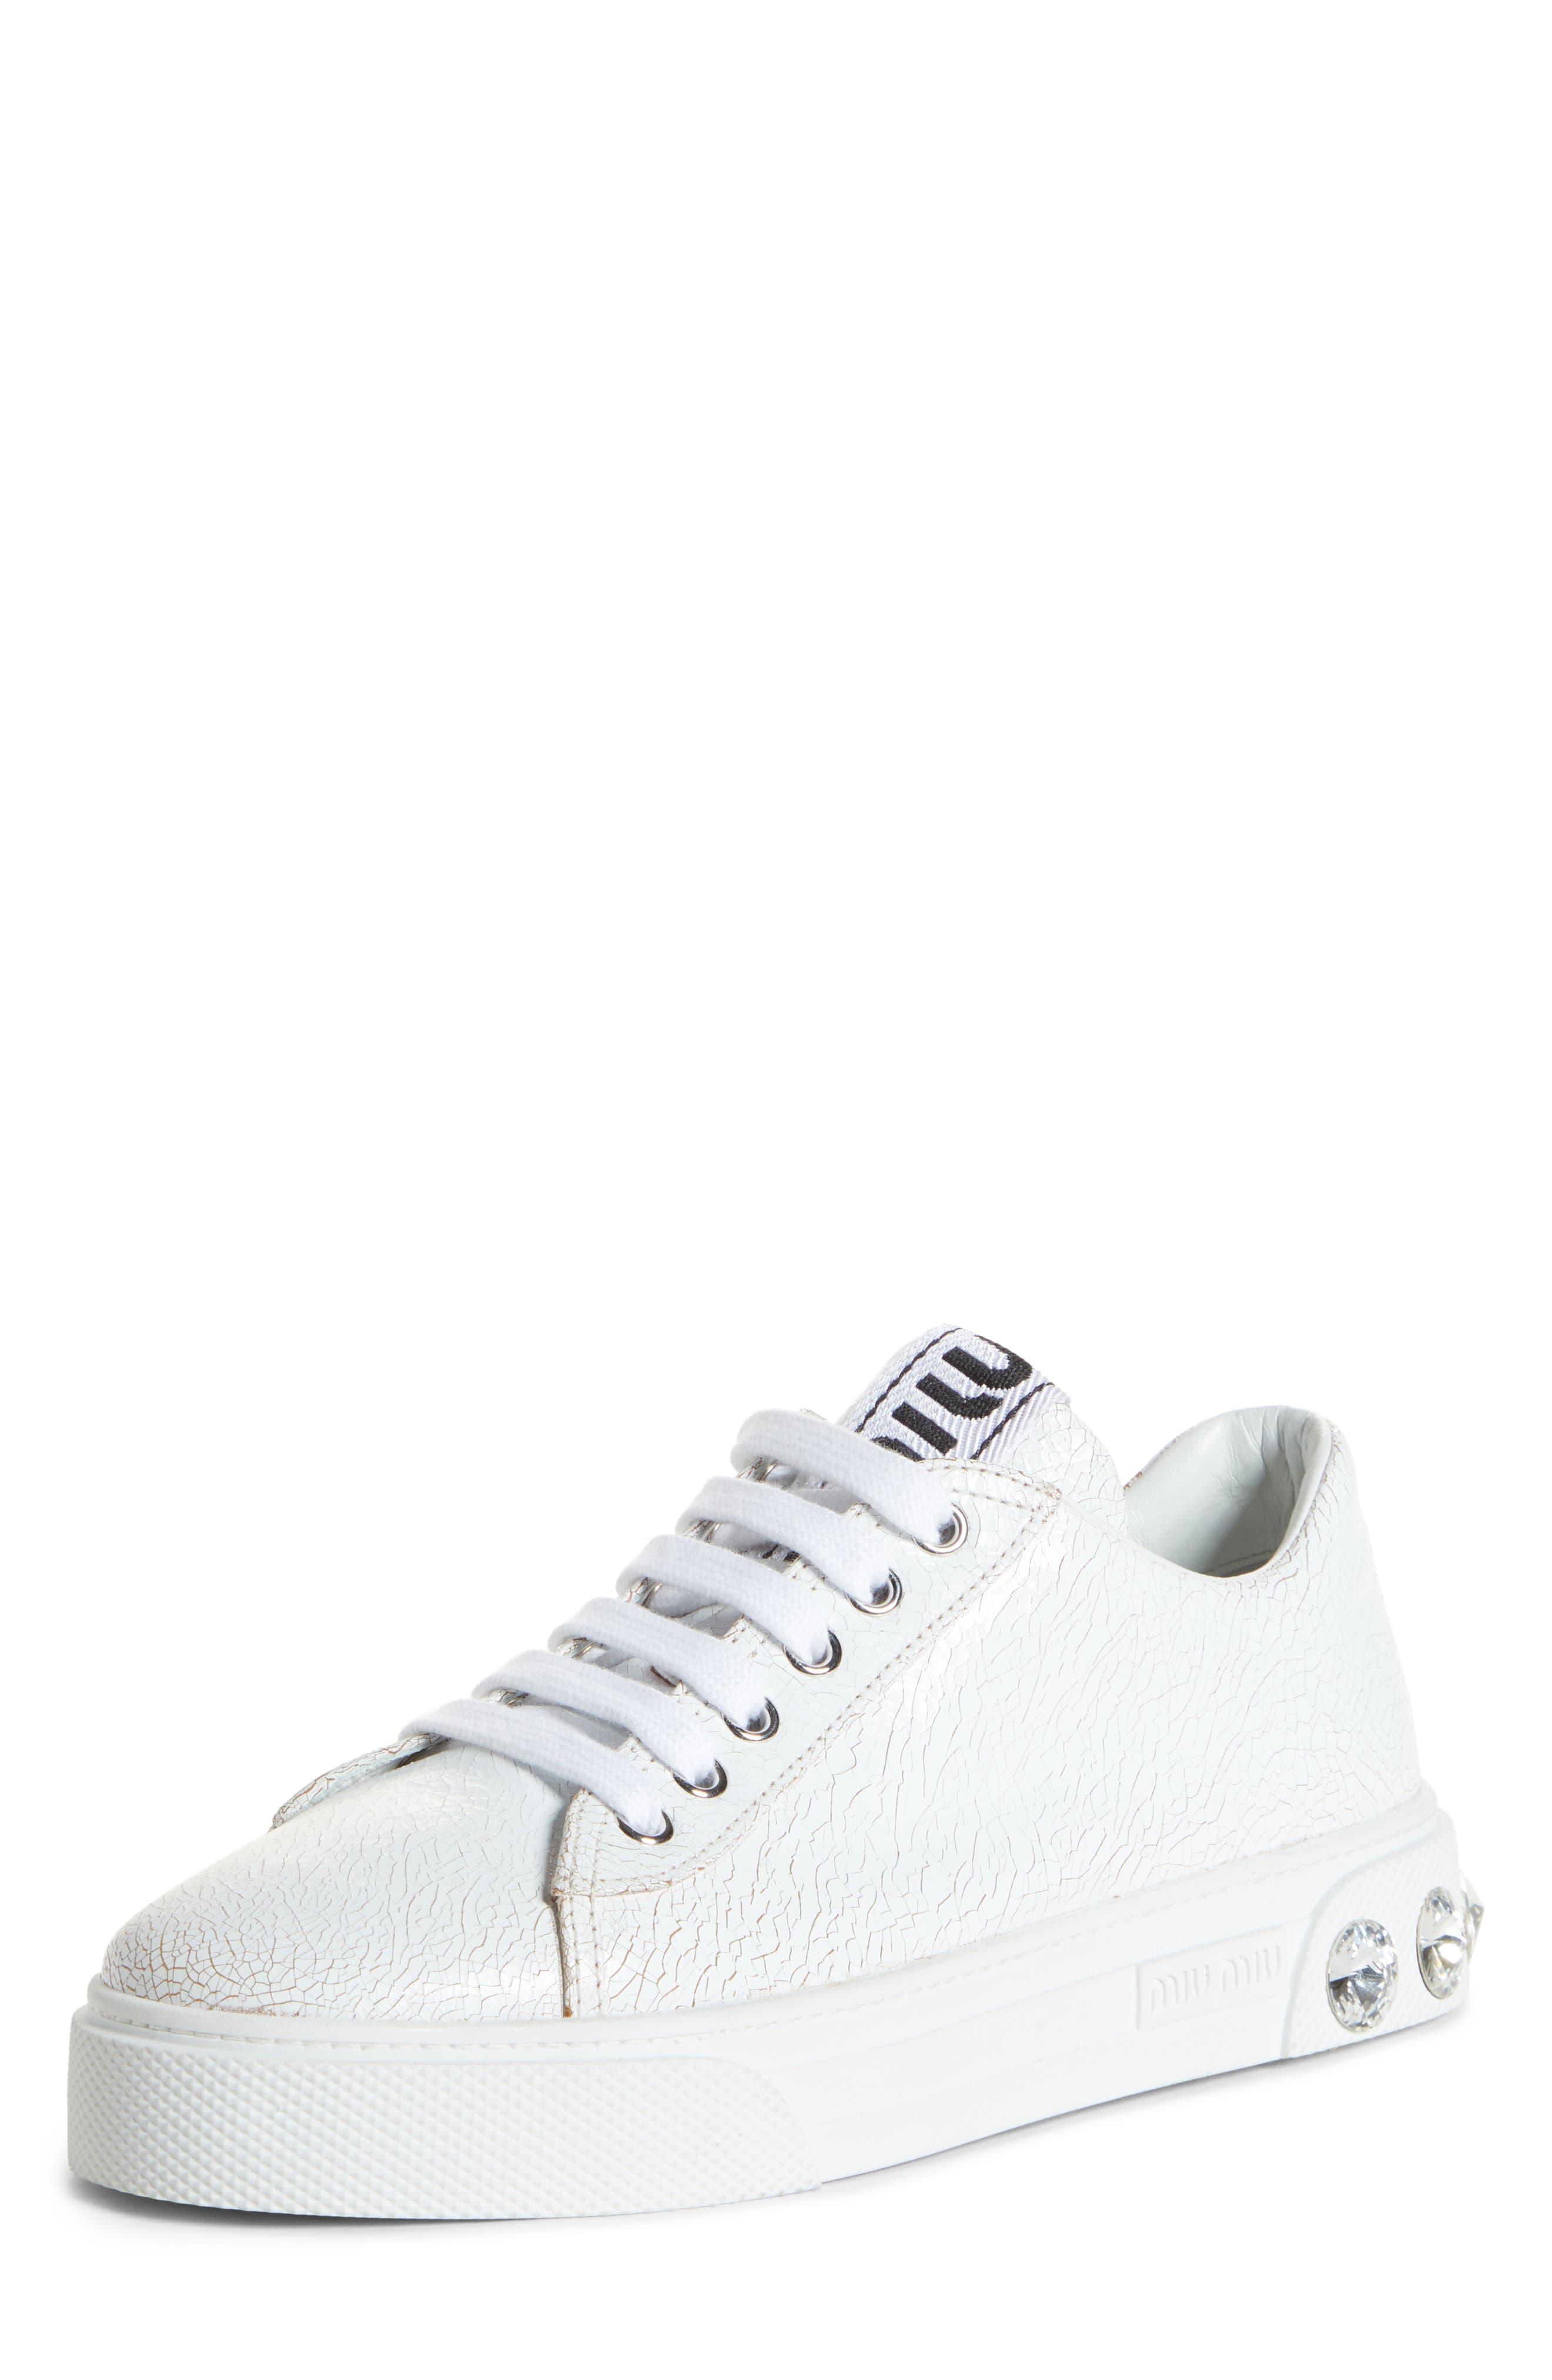 Miu Miu Crystal Detail Skate Sneaker, White